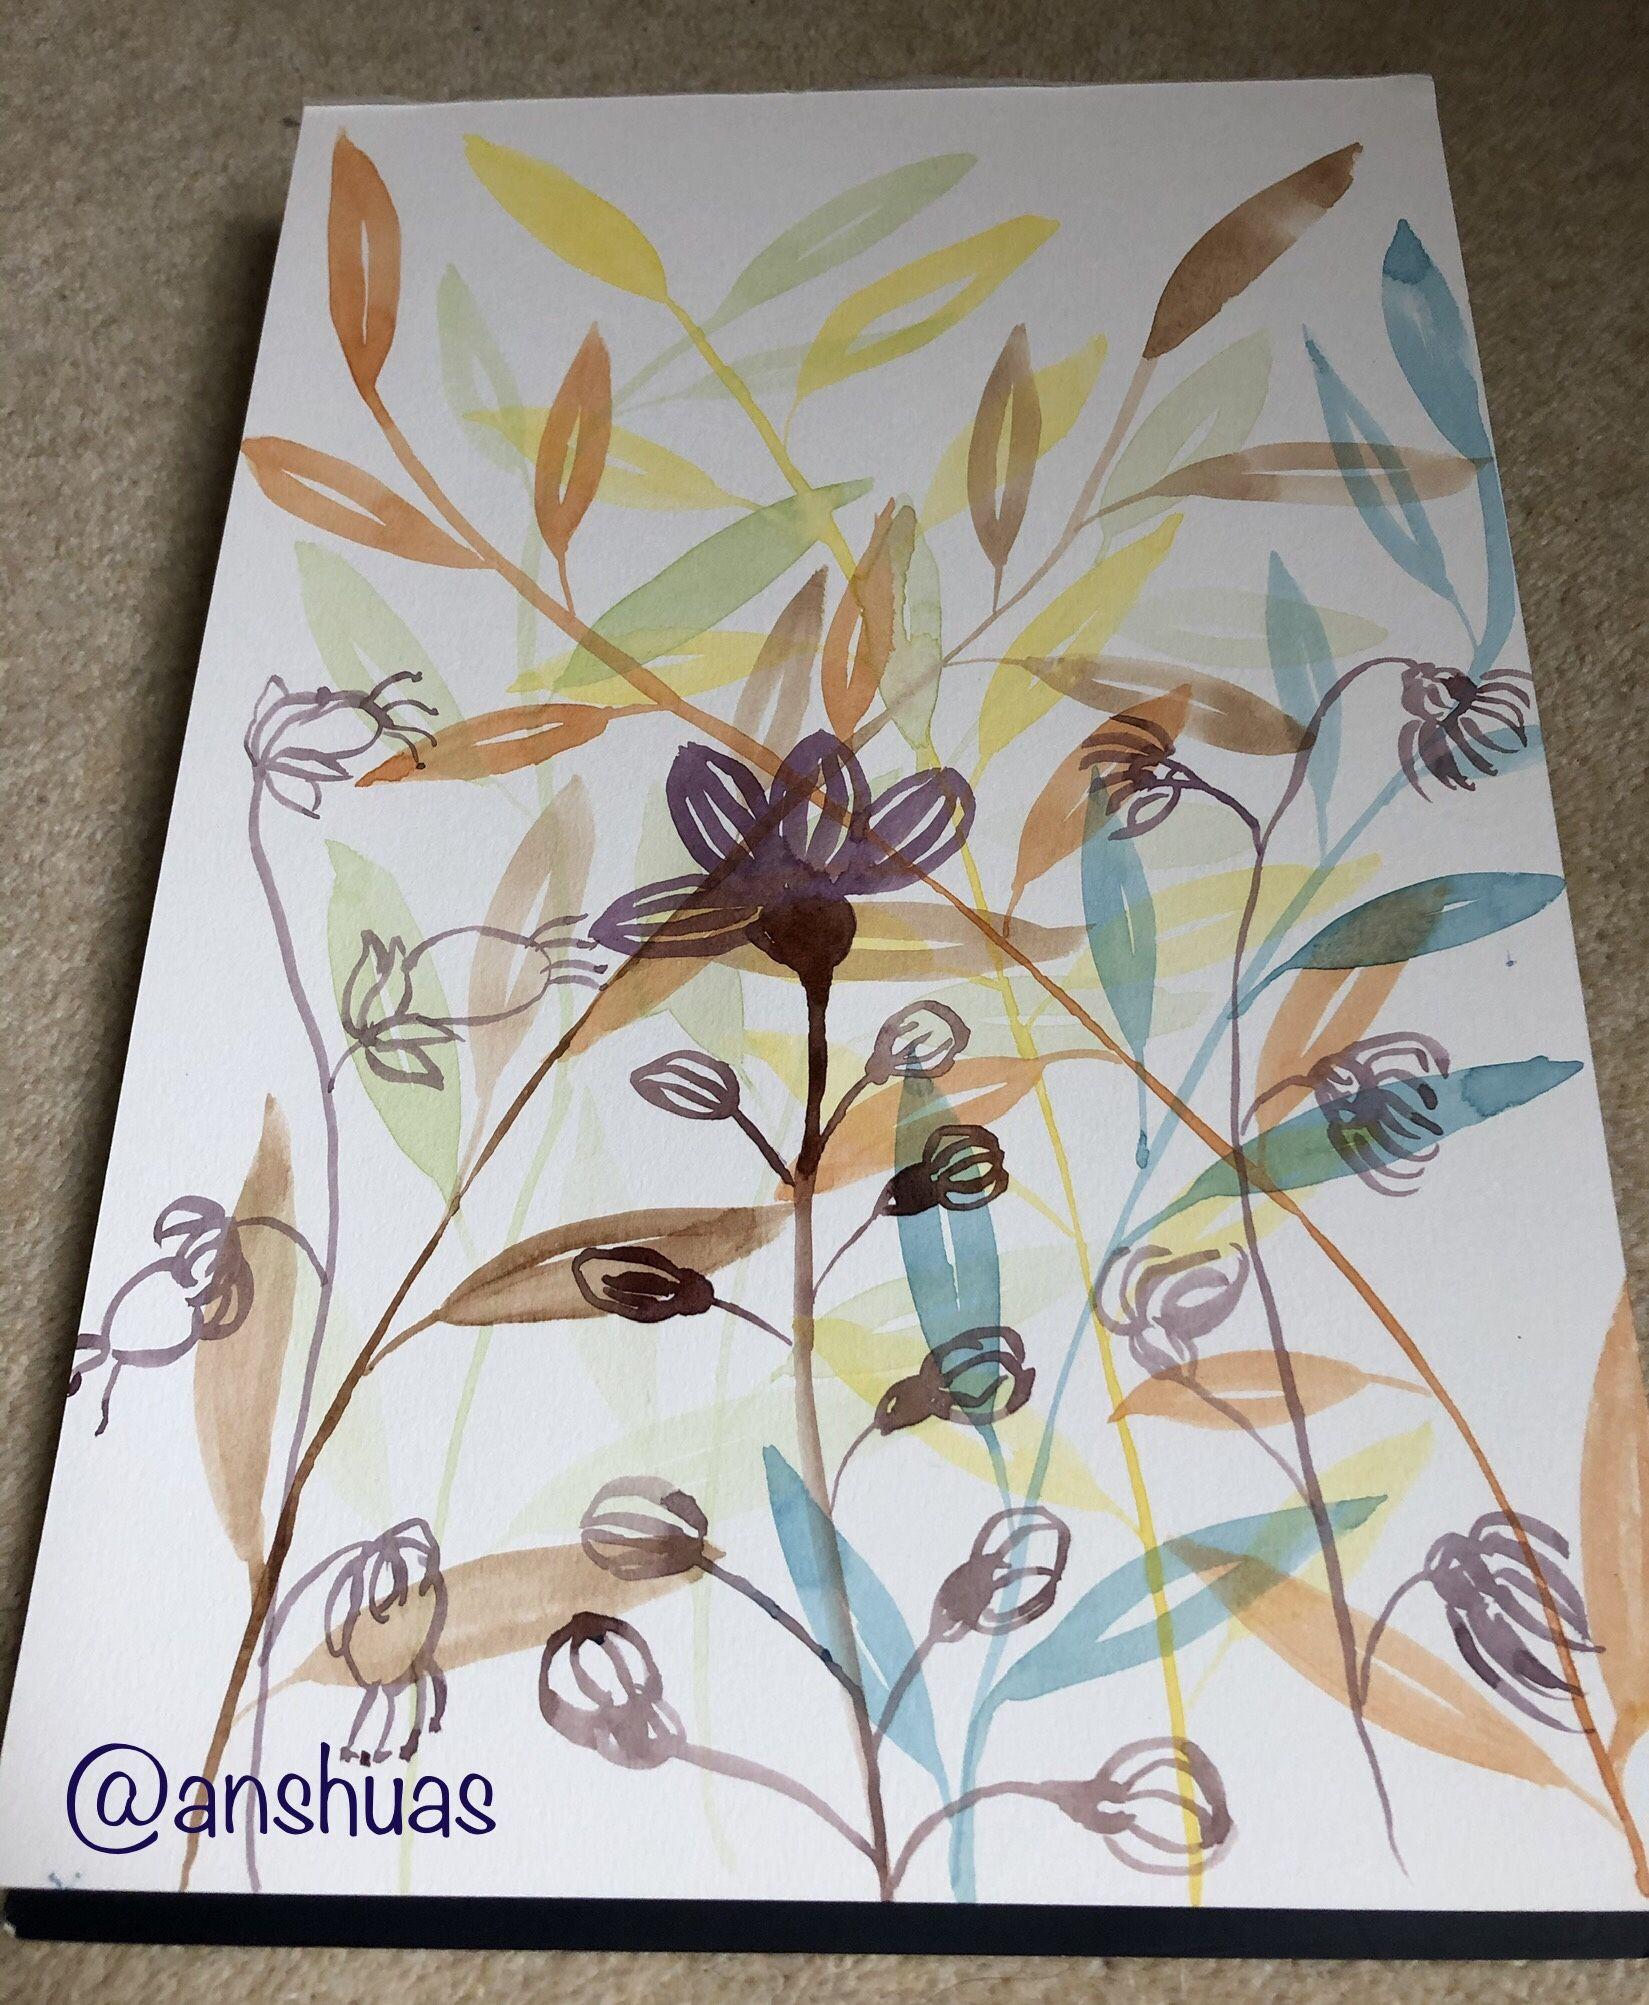 Imagination #ArtTherapy #Lovetopaint #Design #Watercolor #HappySunday – World Through Lenses